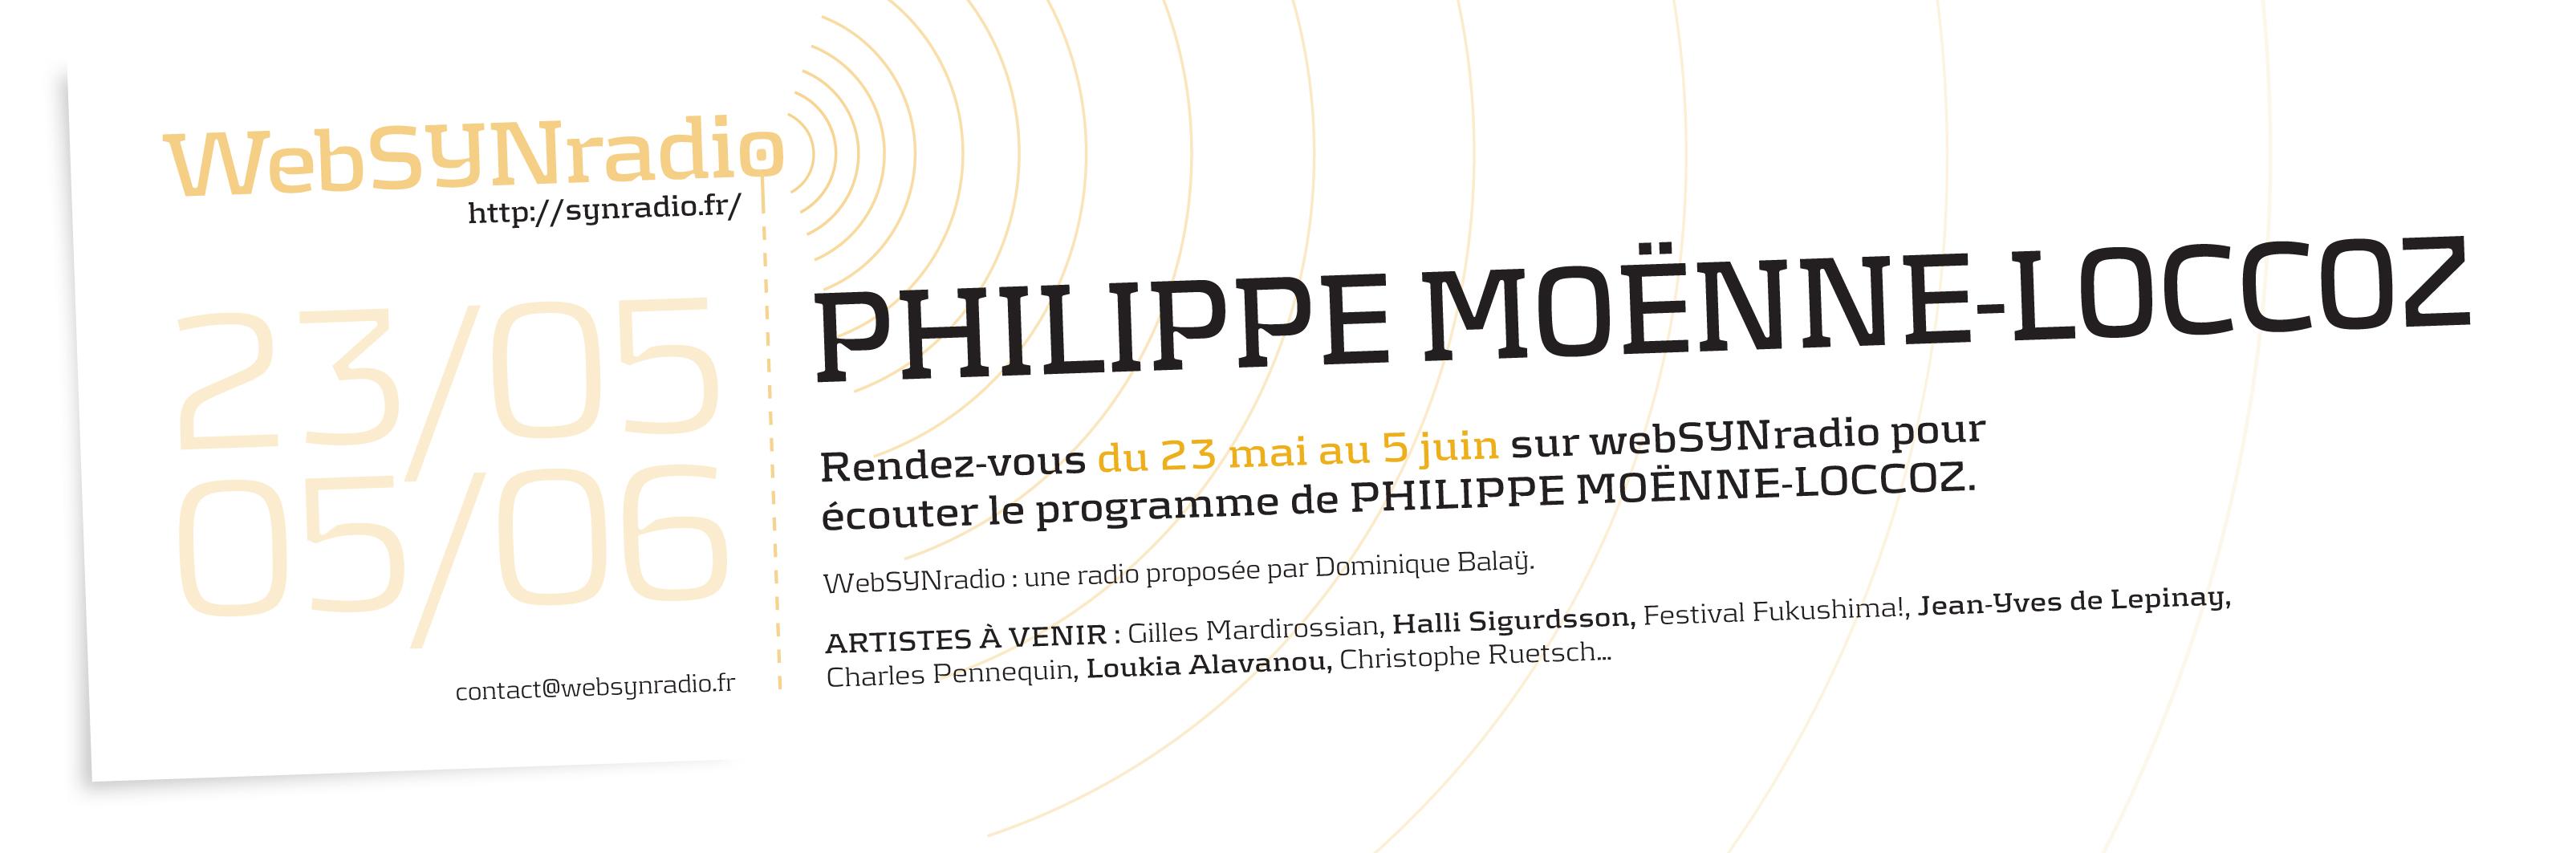 Philippe-Moënne-Loccoz websynradio